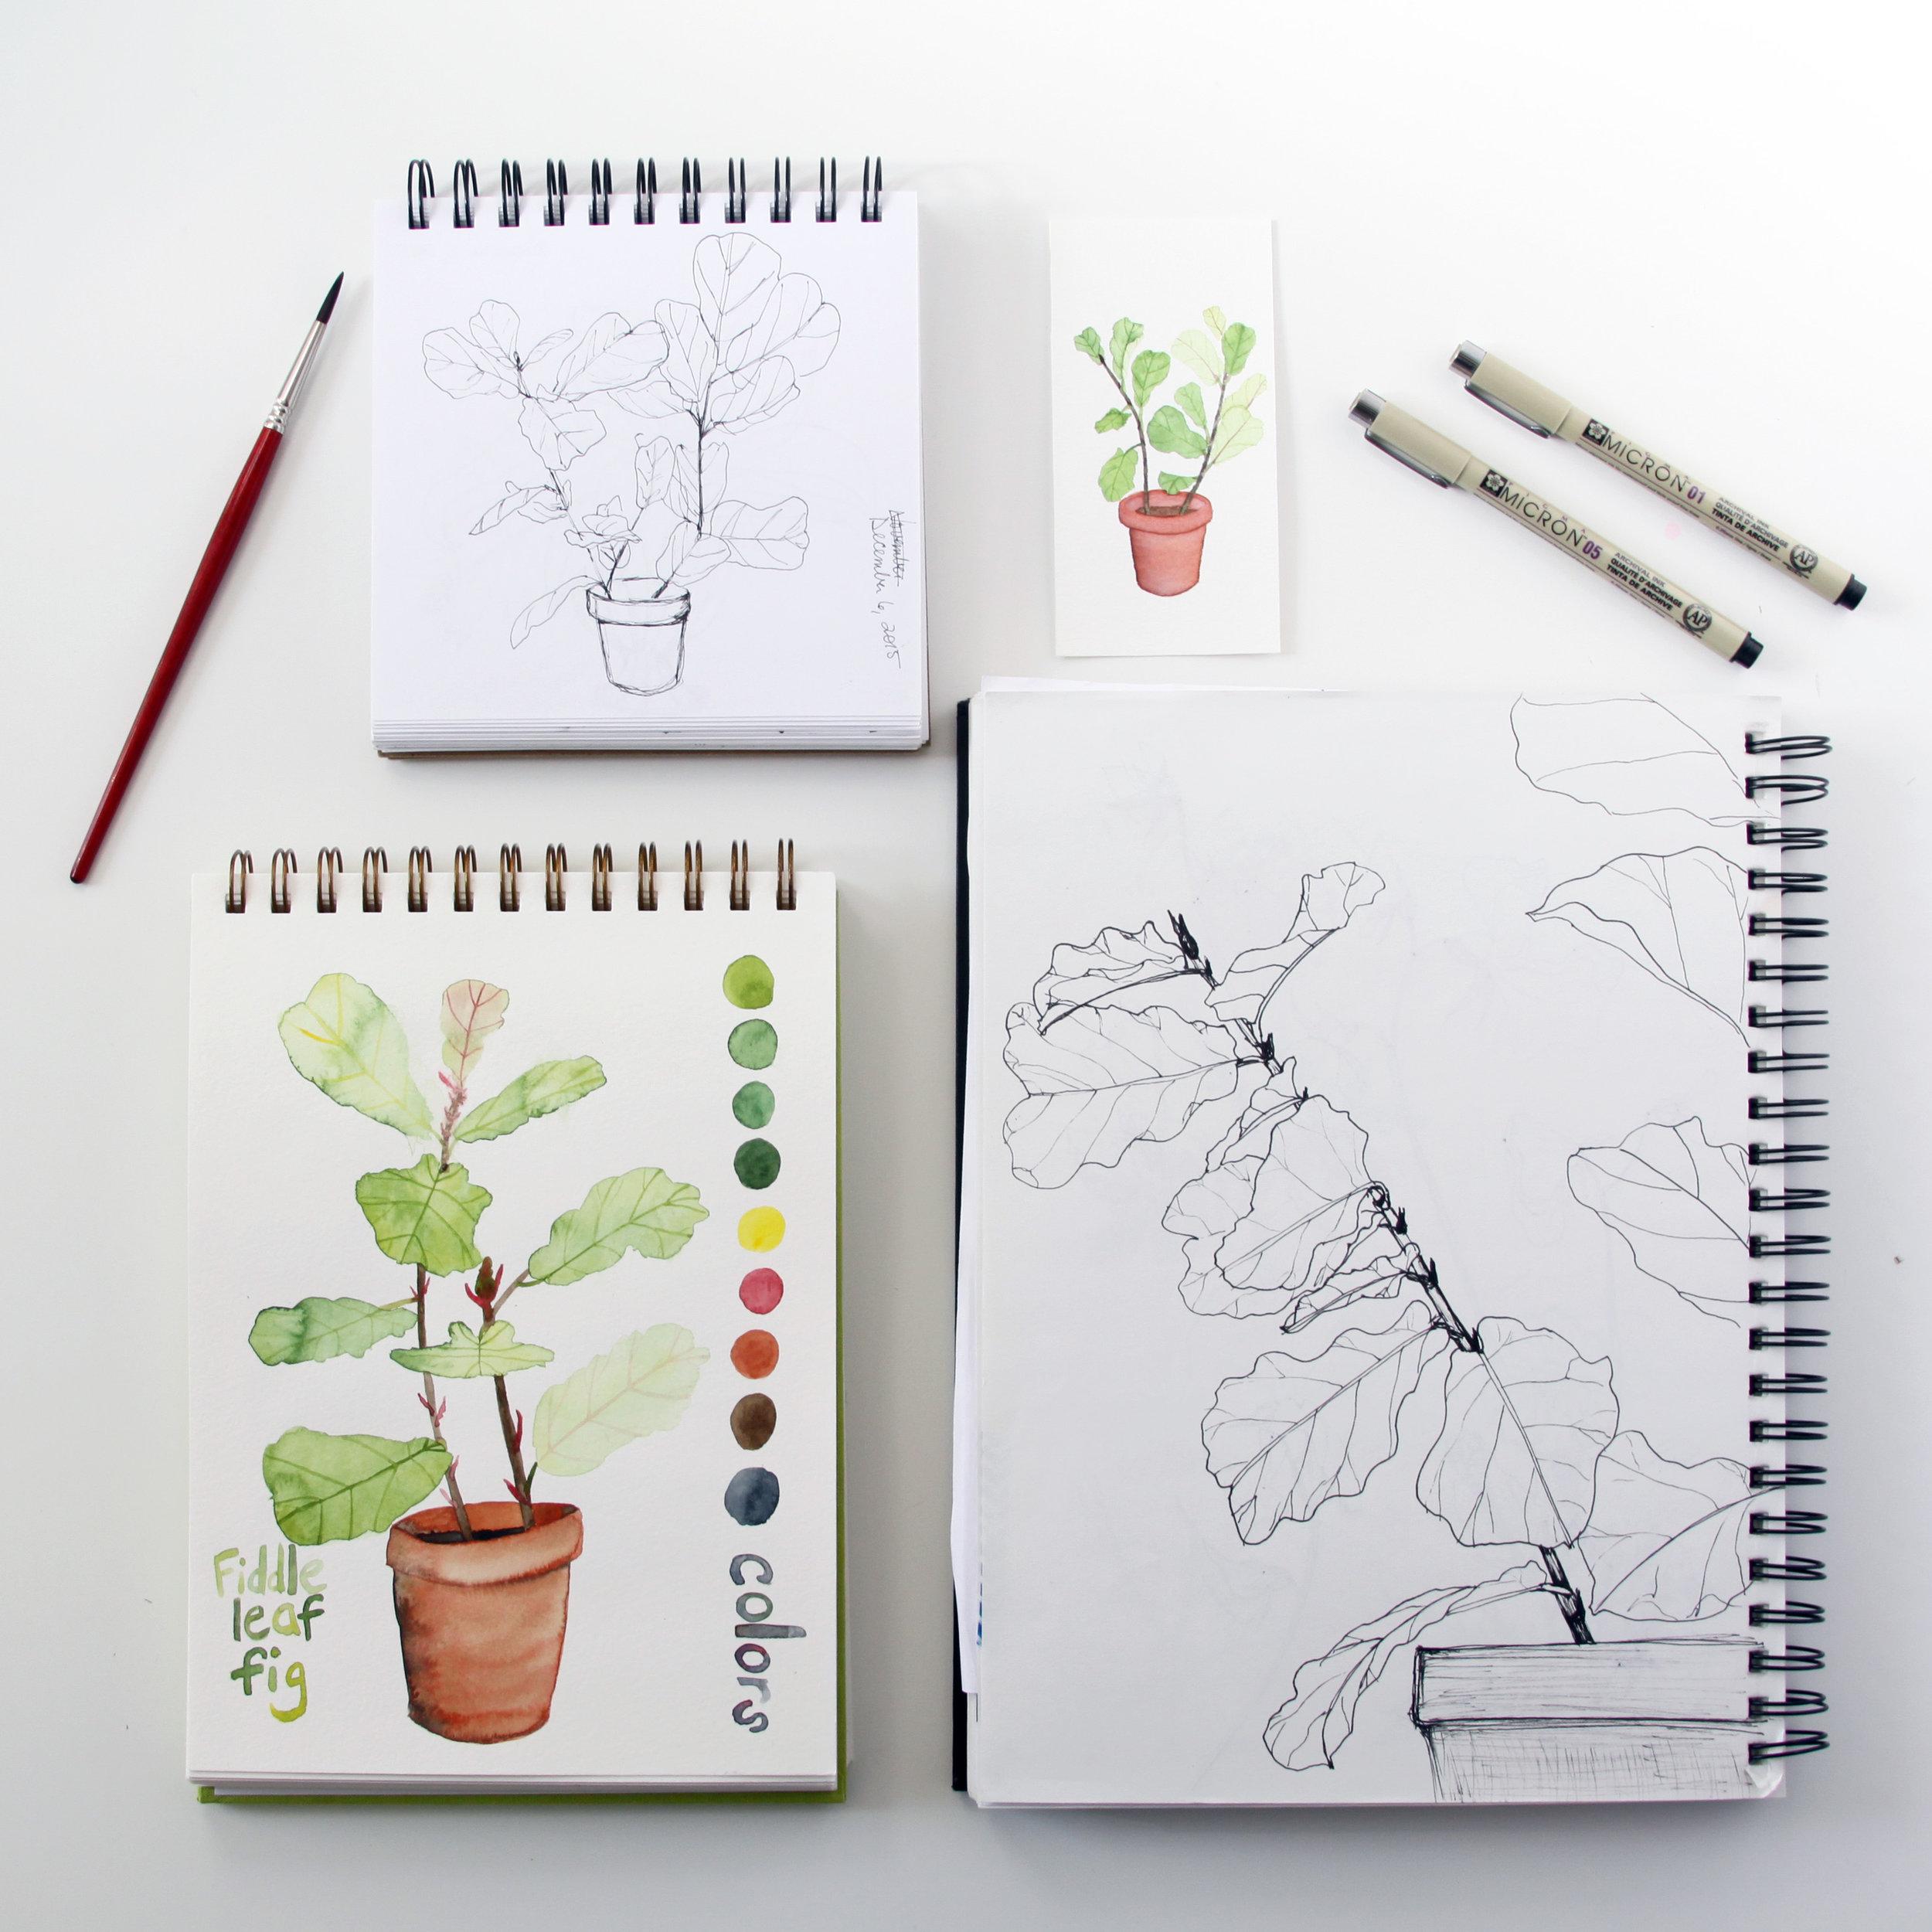 Fiddle Leaf Figs in Anne Butera's Sketchbooks